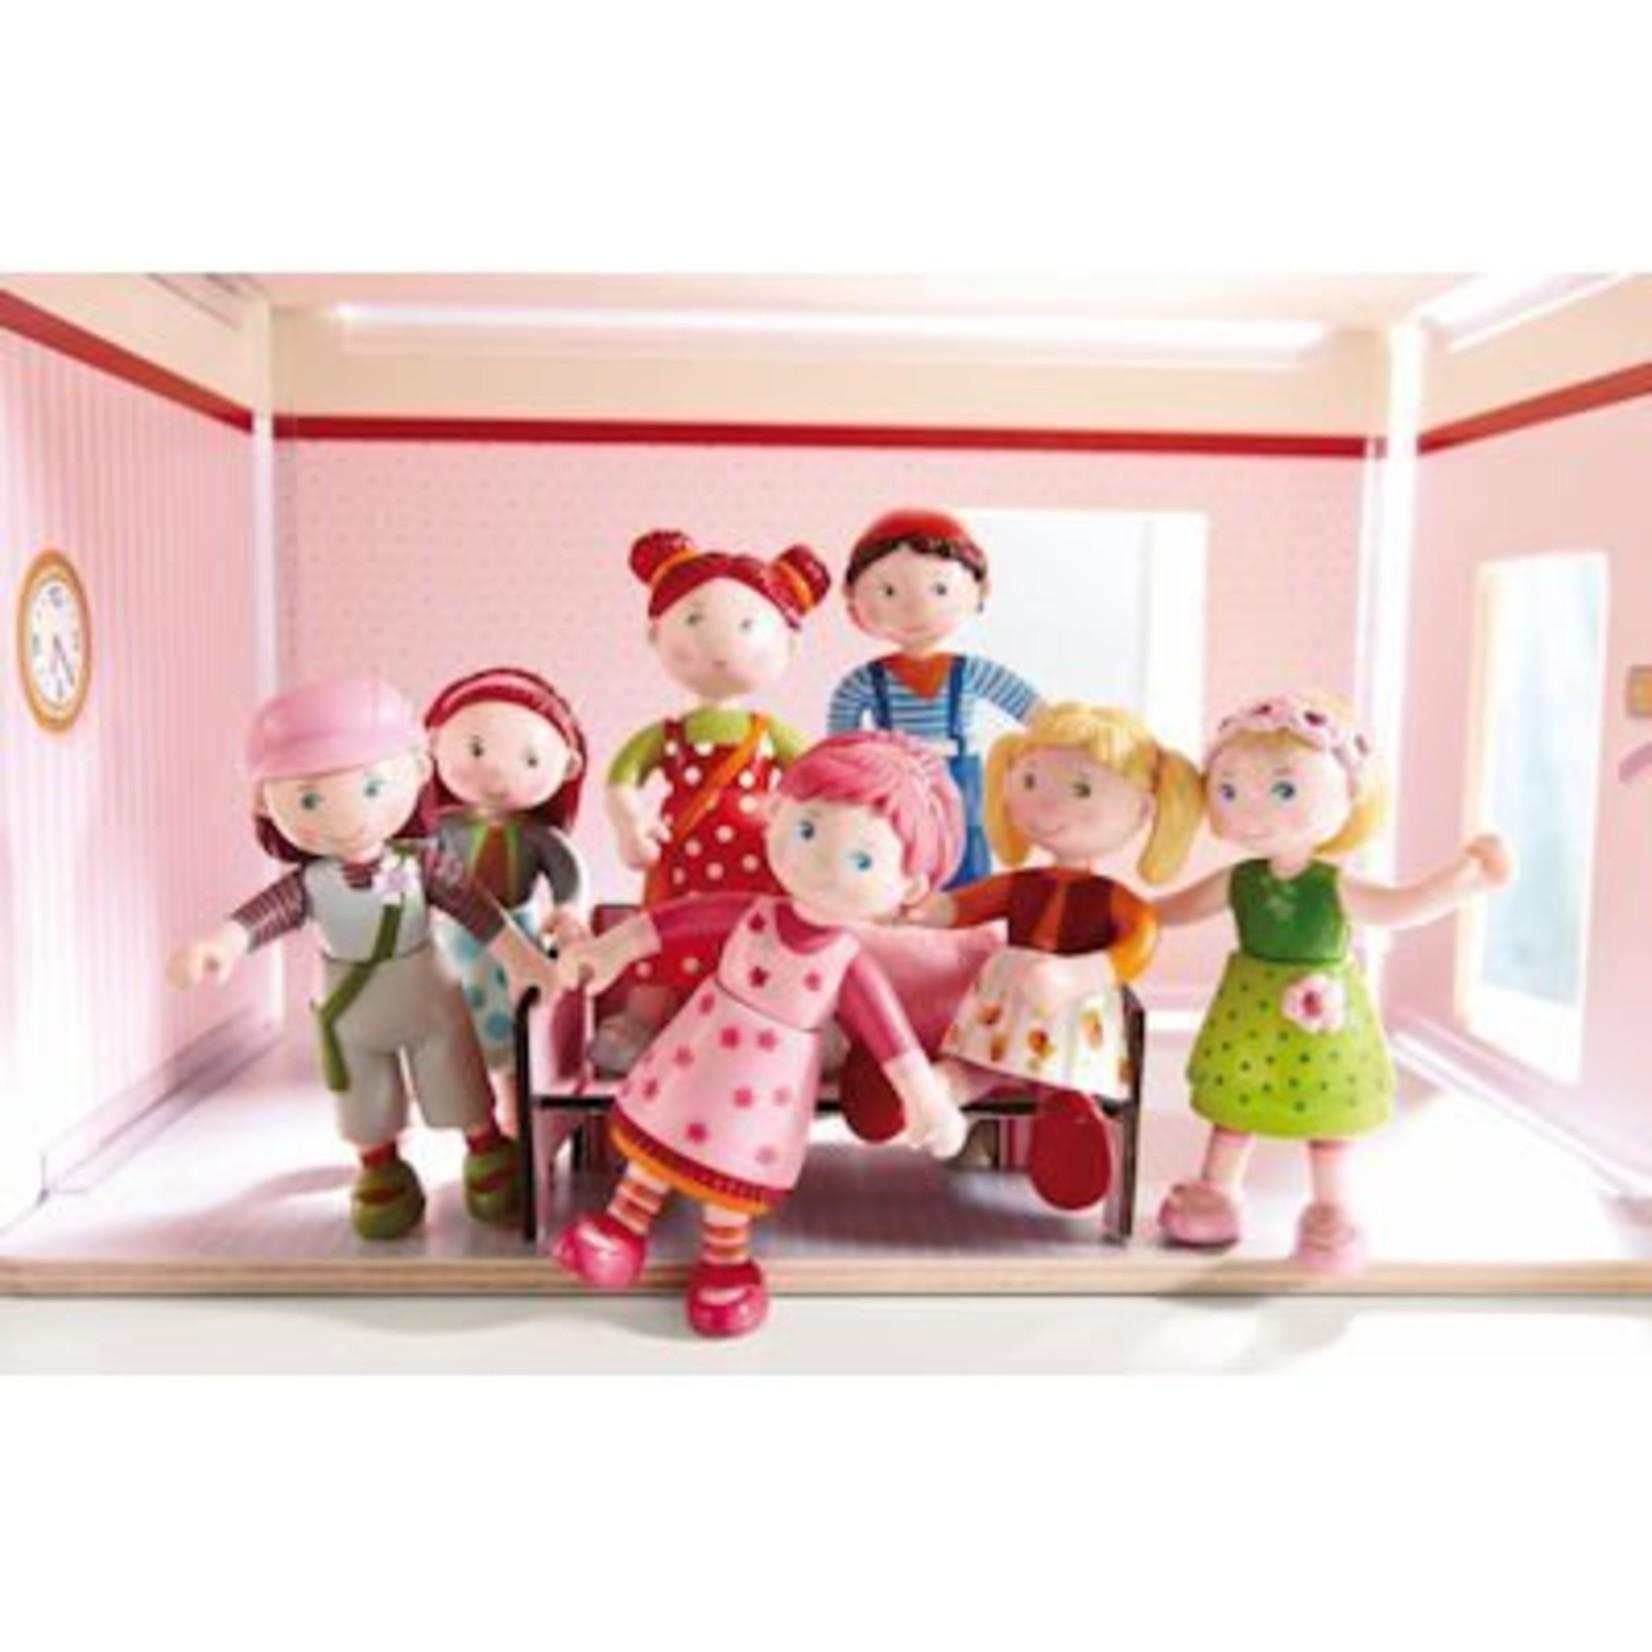 Haba Little Friends poppenhuisfiguurtje Schaap